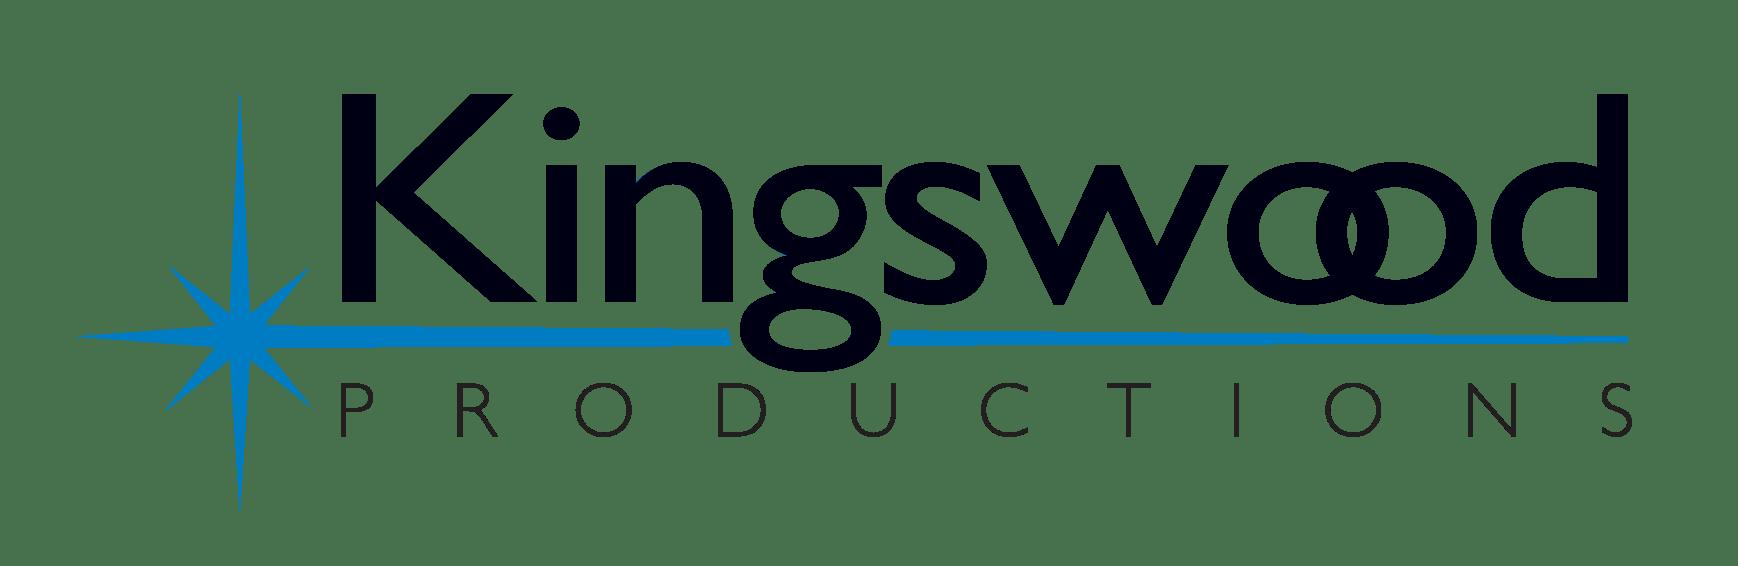 Kingswood Productions logo